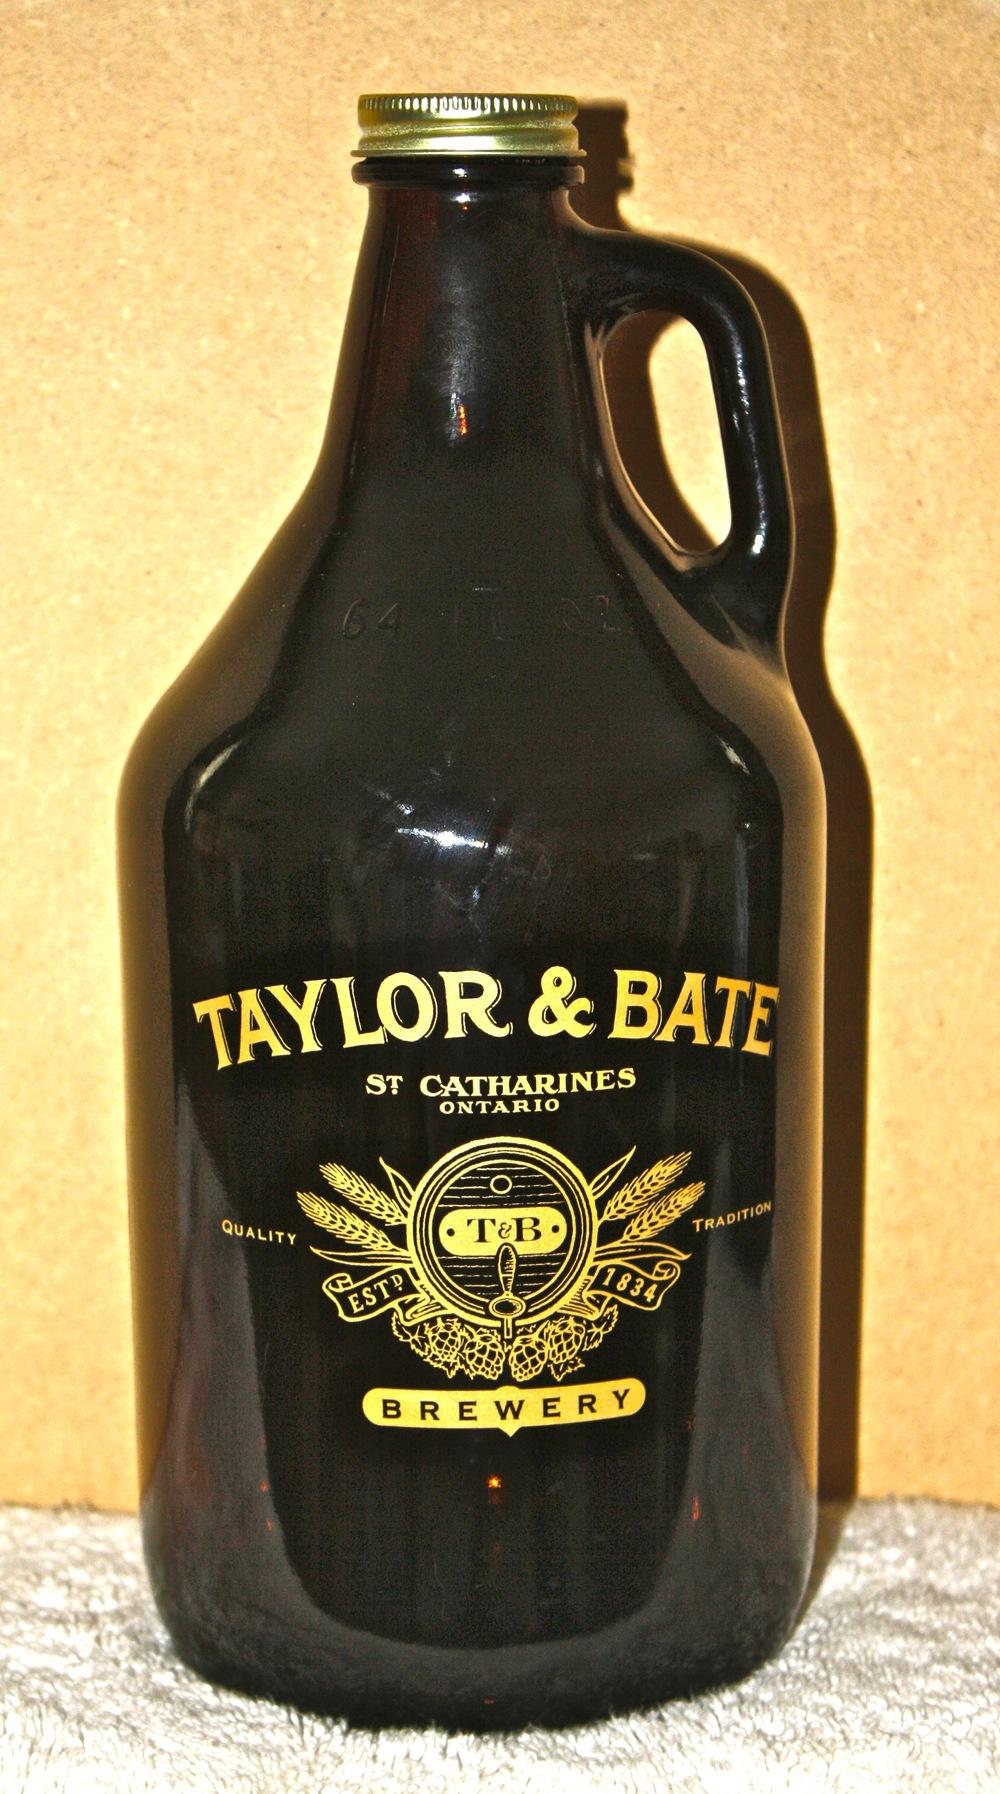 GR - Taylor & Bate.jpg